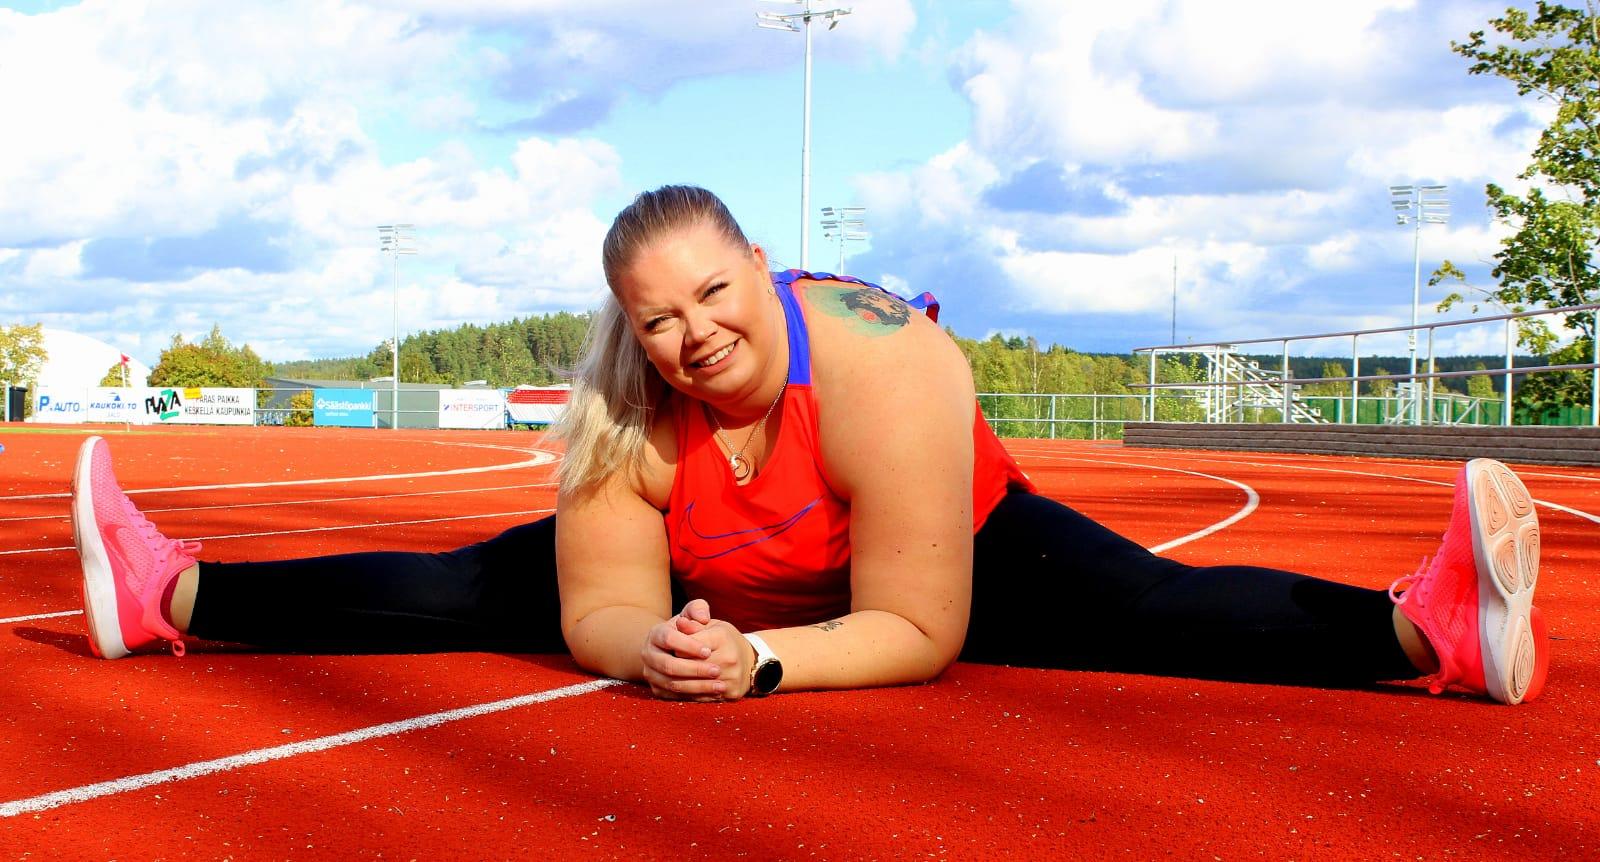 Lihavuusleikattu personal trainer